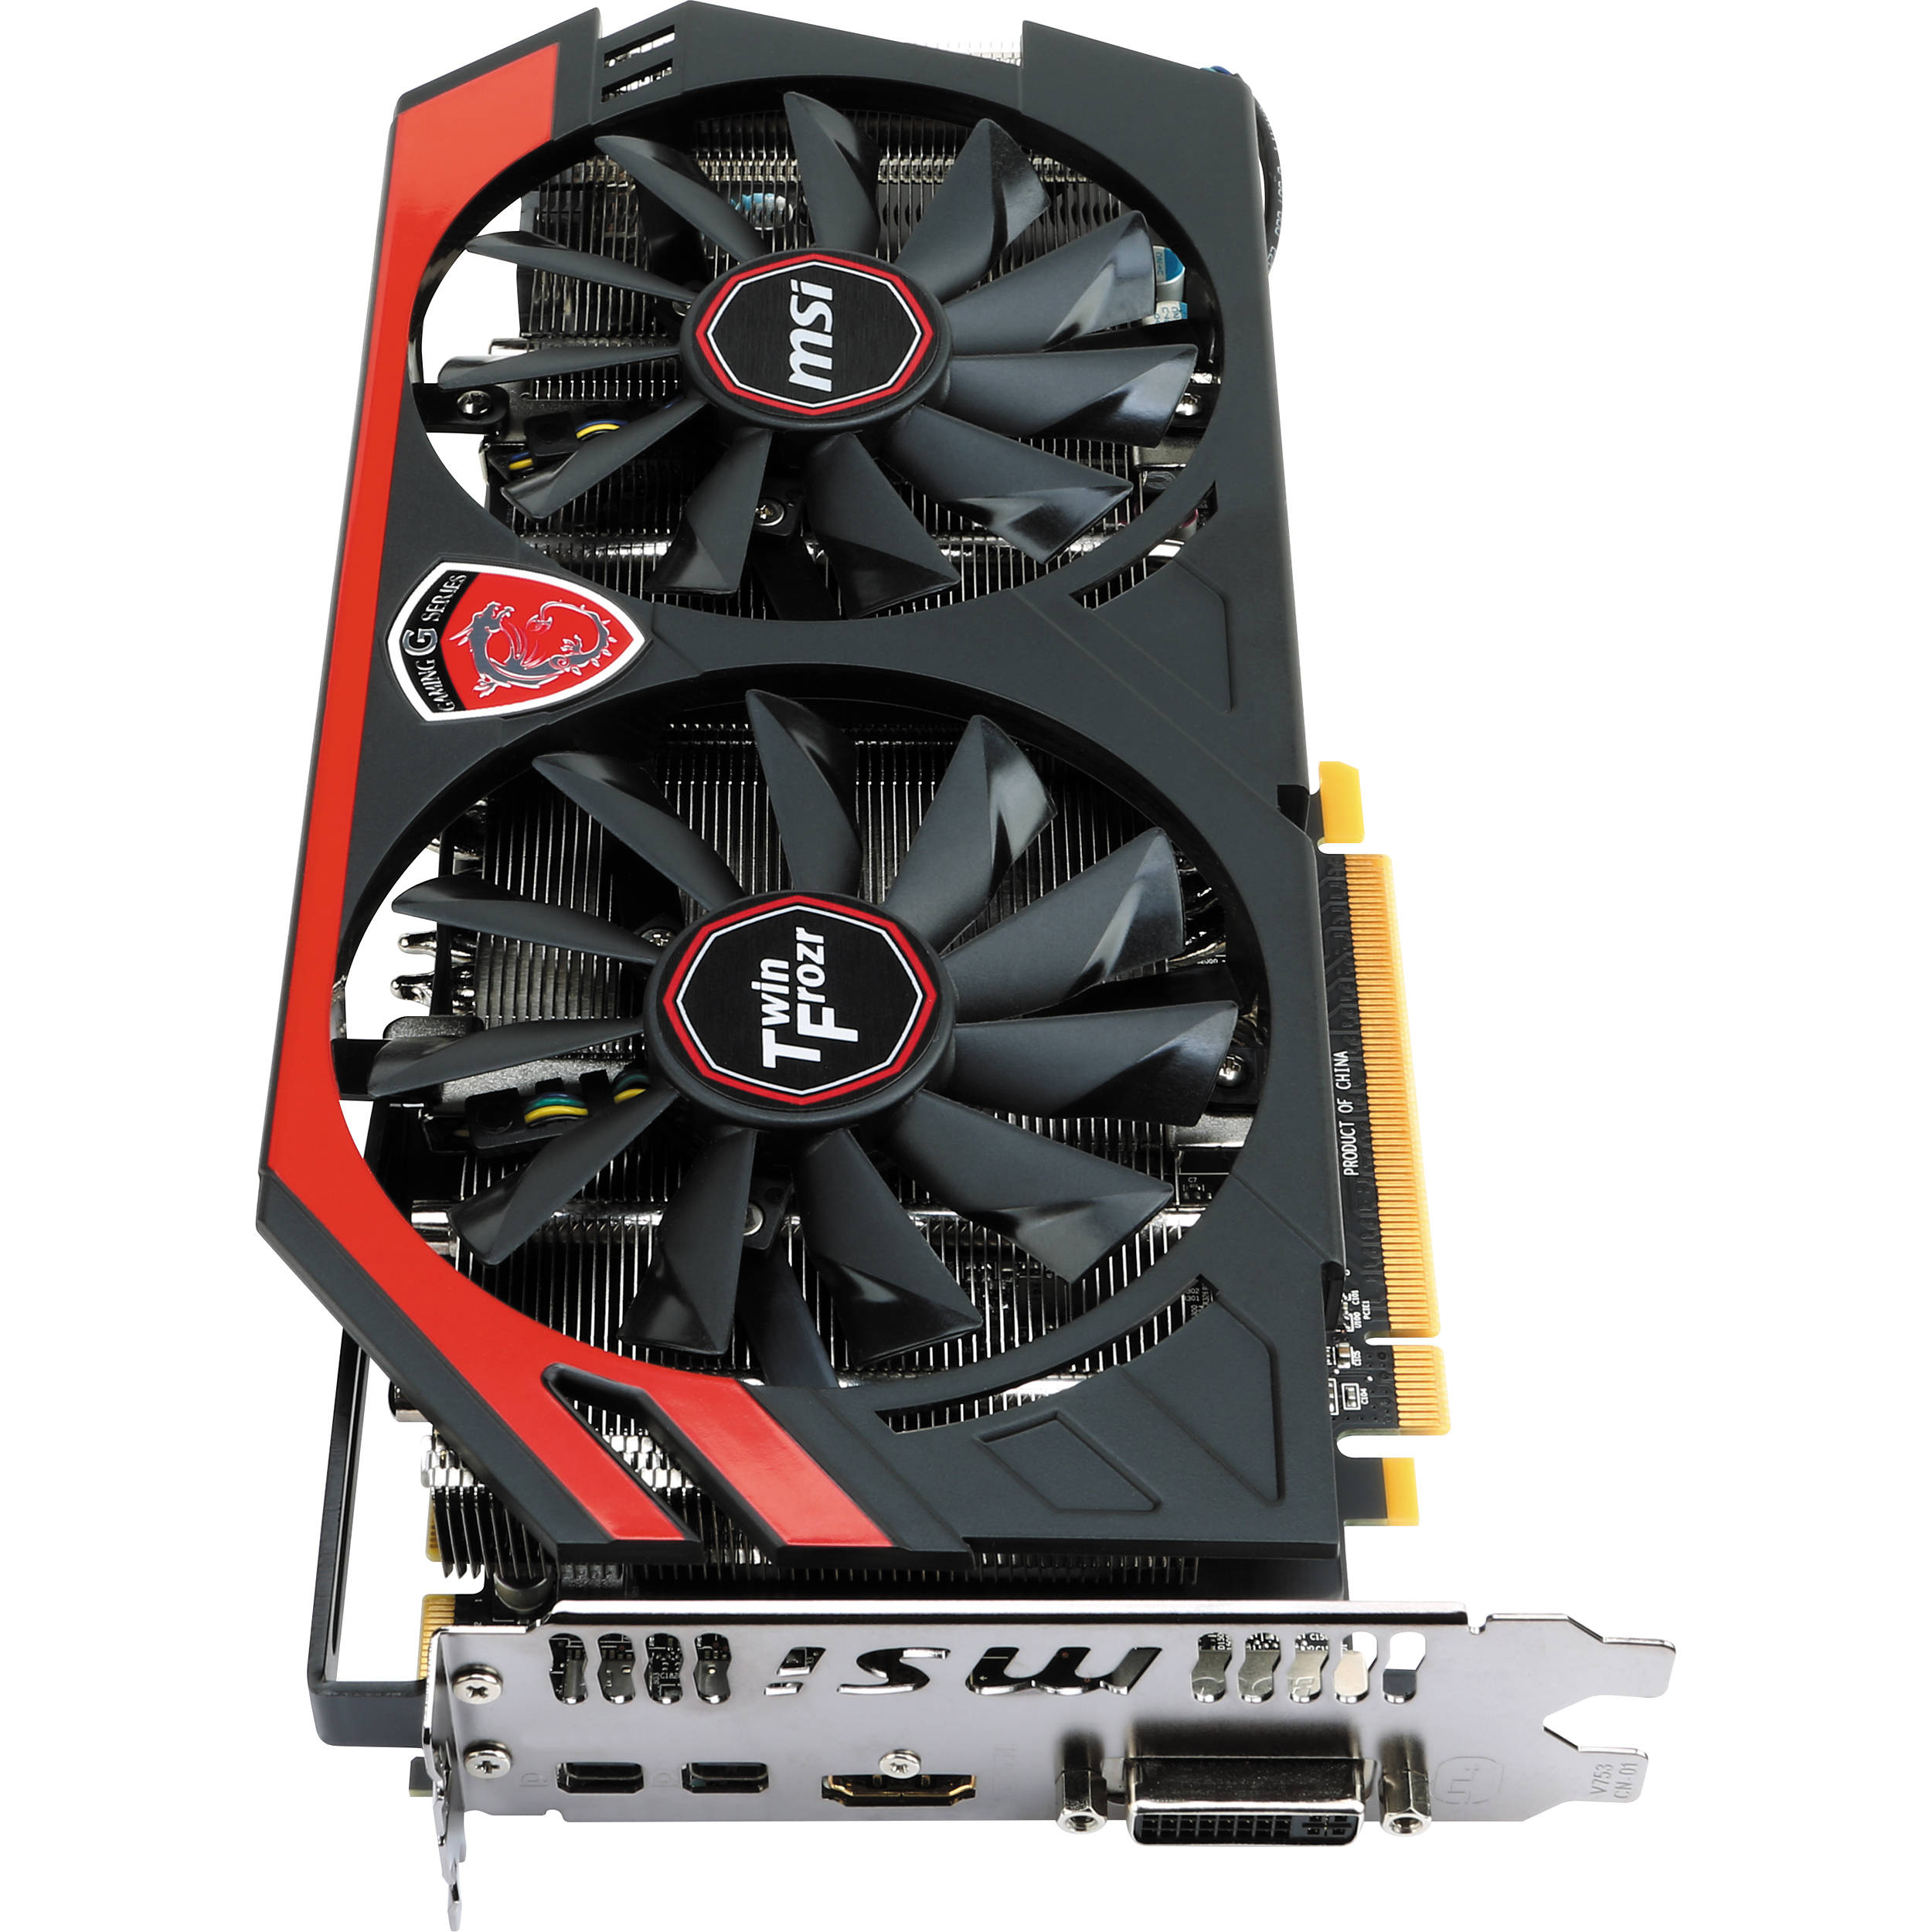 MSI AMD Radeon R9 280X Gaming Graphics Card